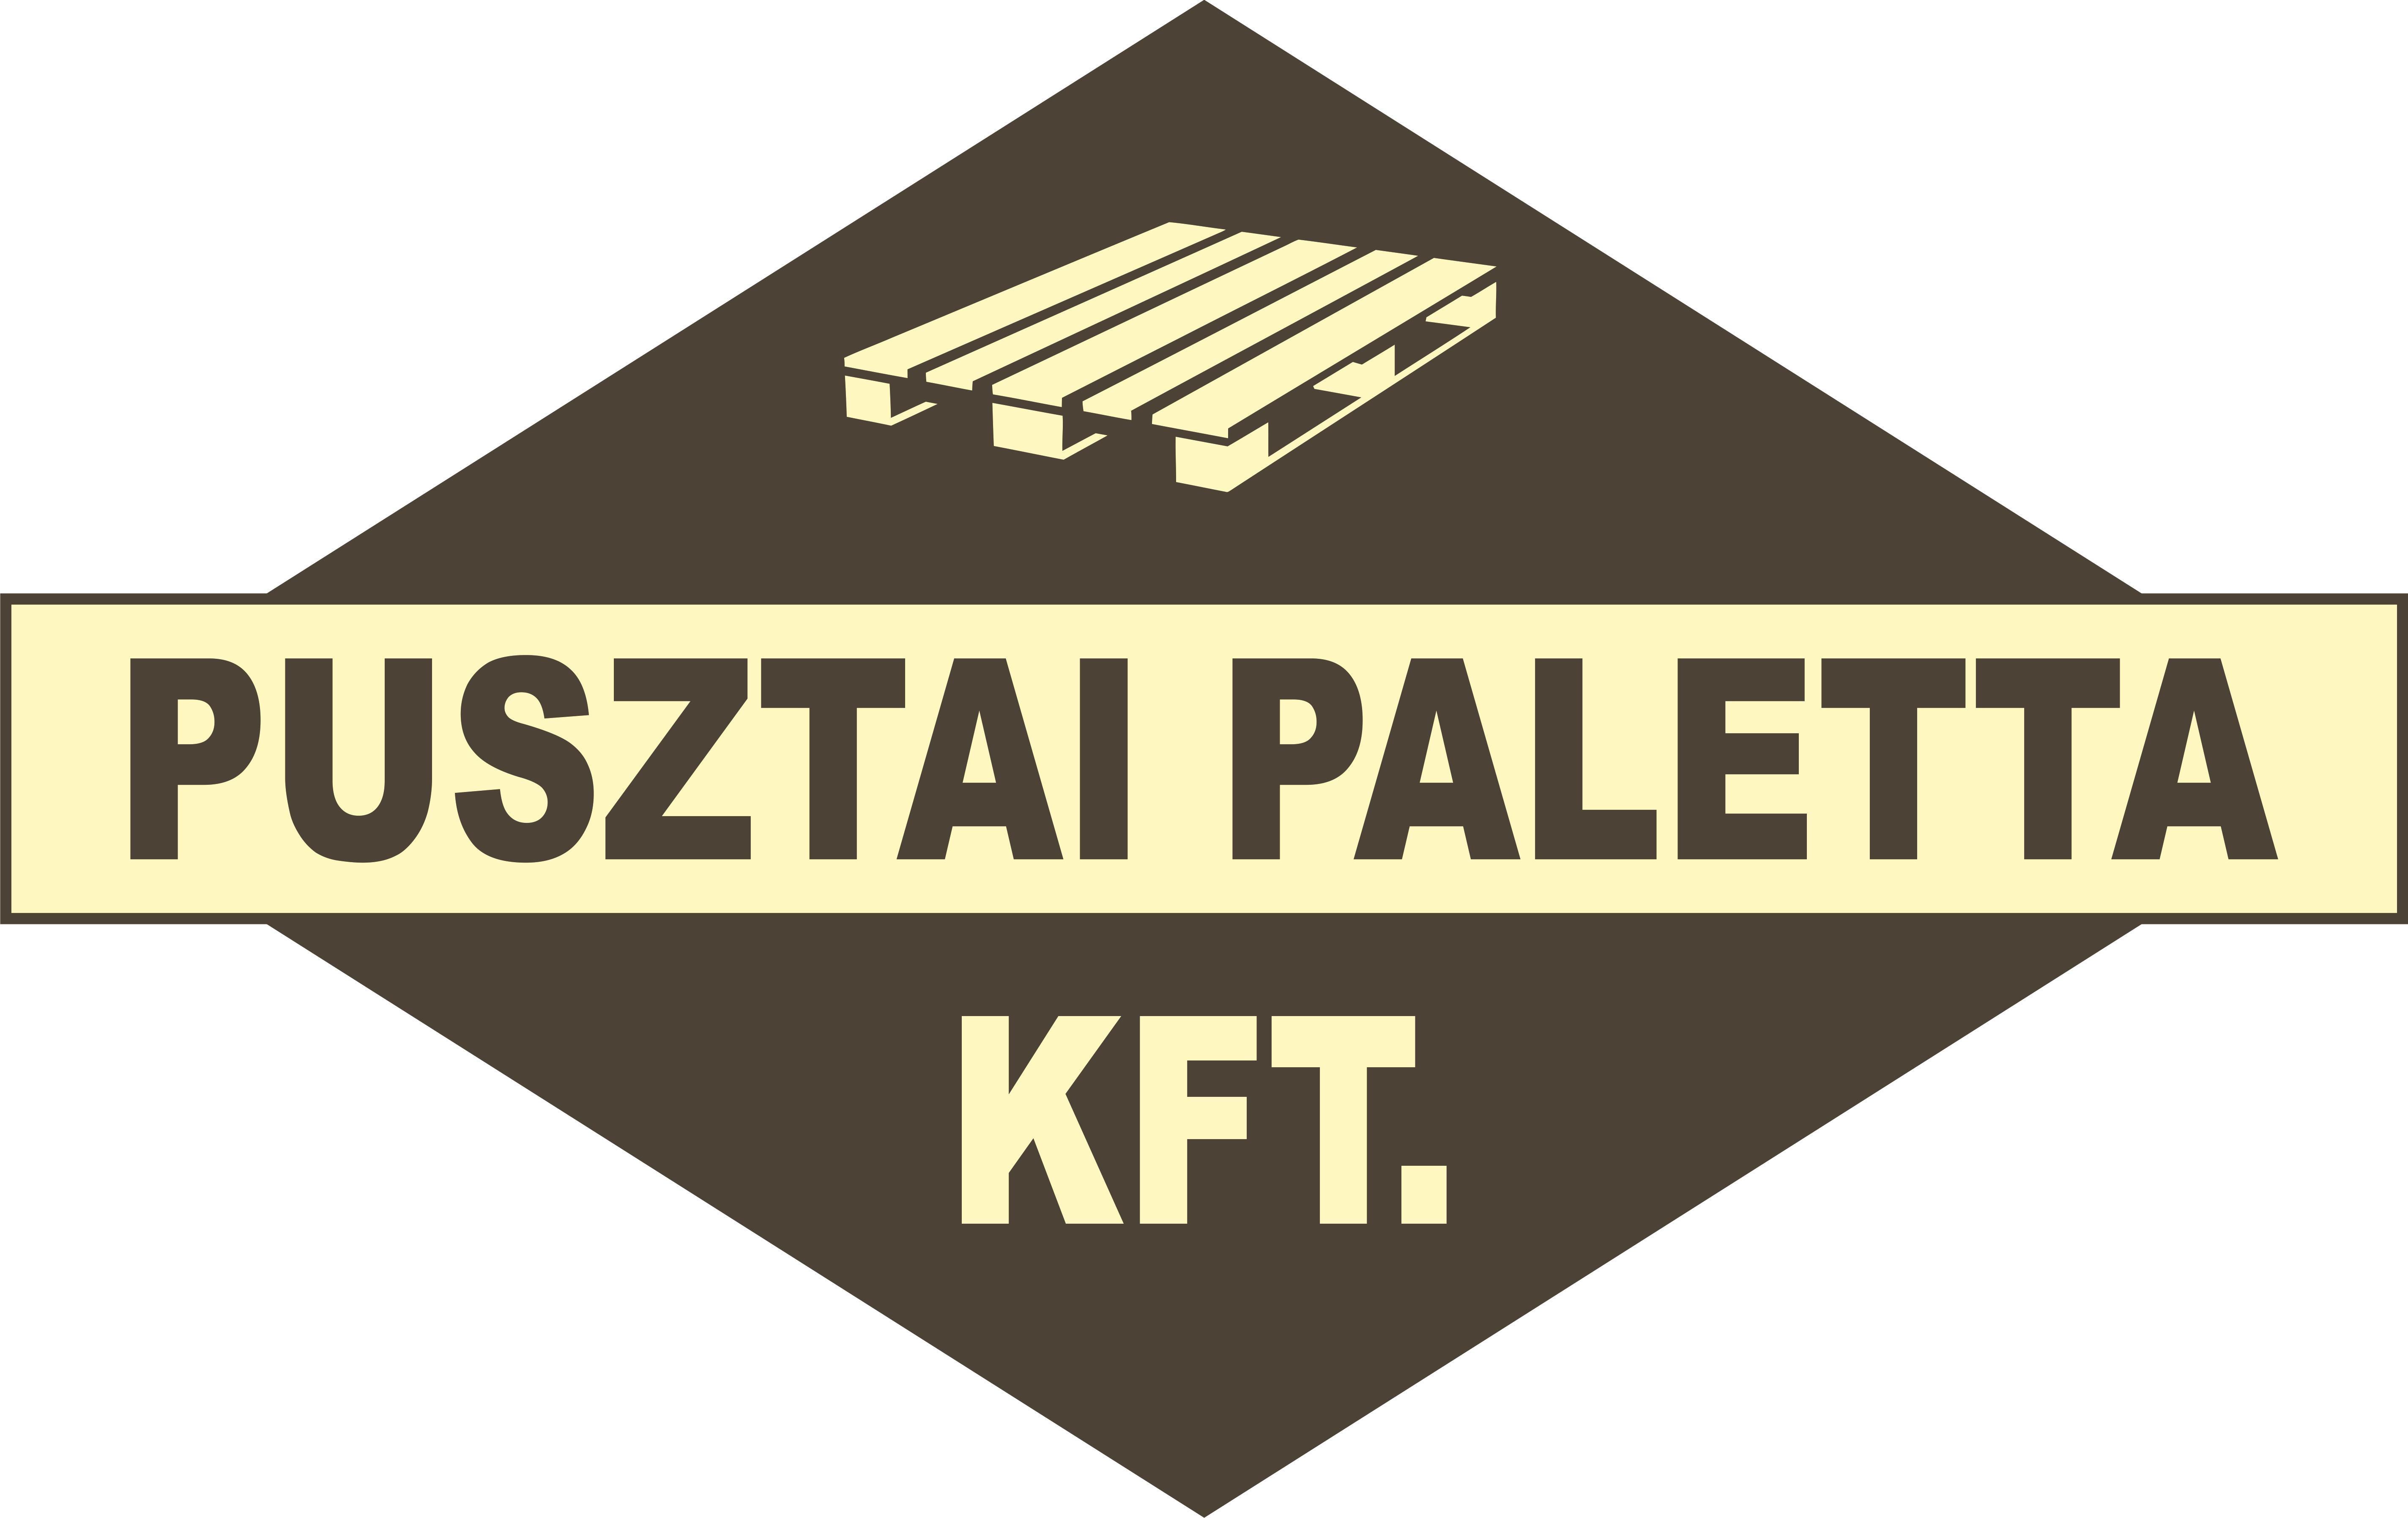 Pusztai Paletta Kft.